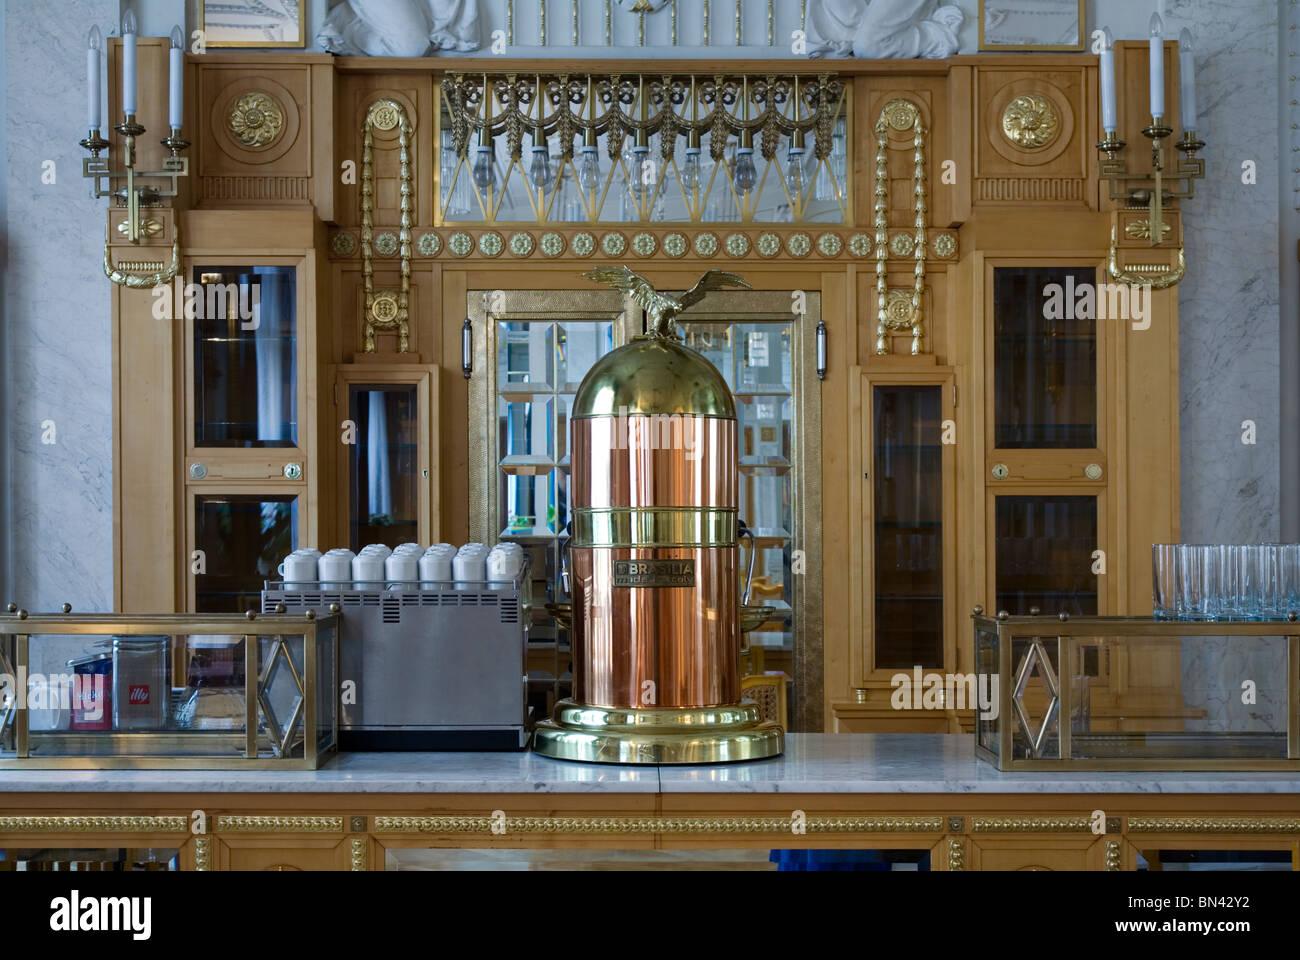 Antique Coffee Percolator Stock Photos & Antique Coffee